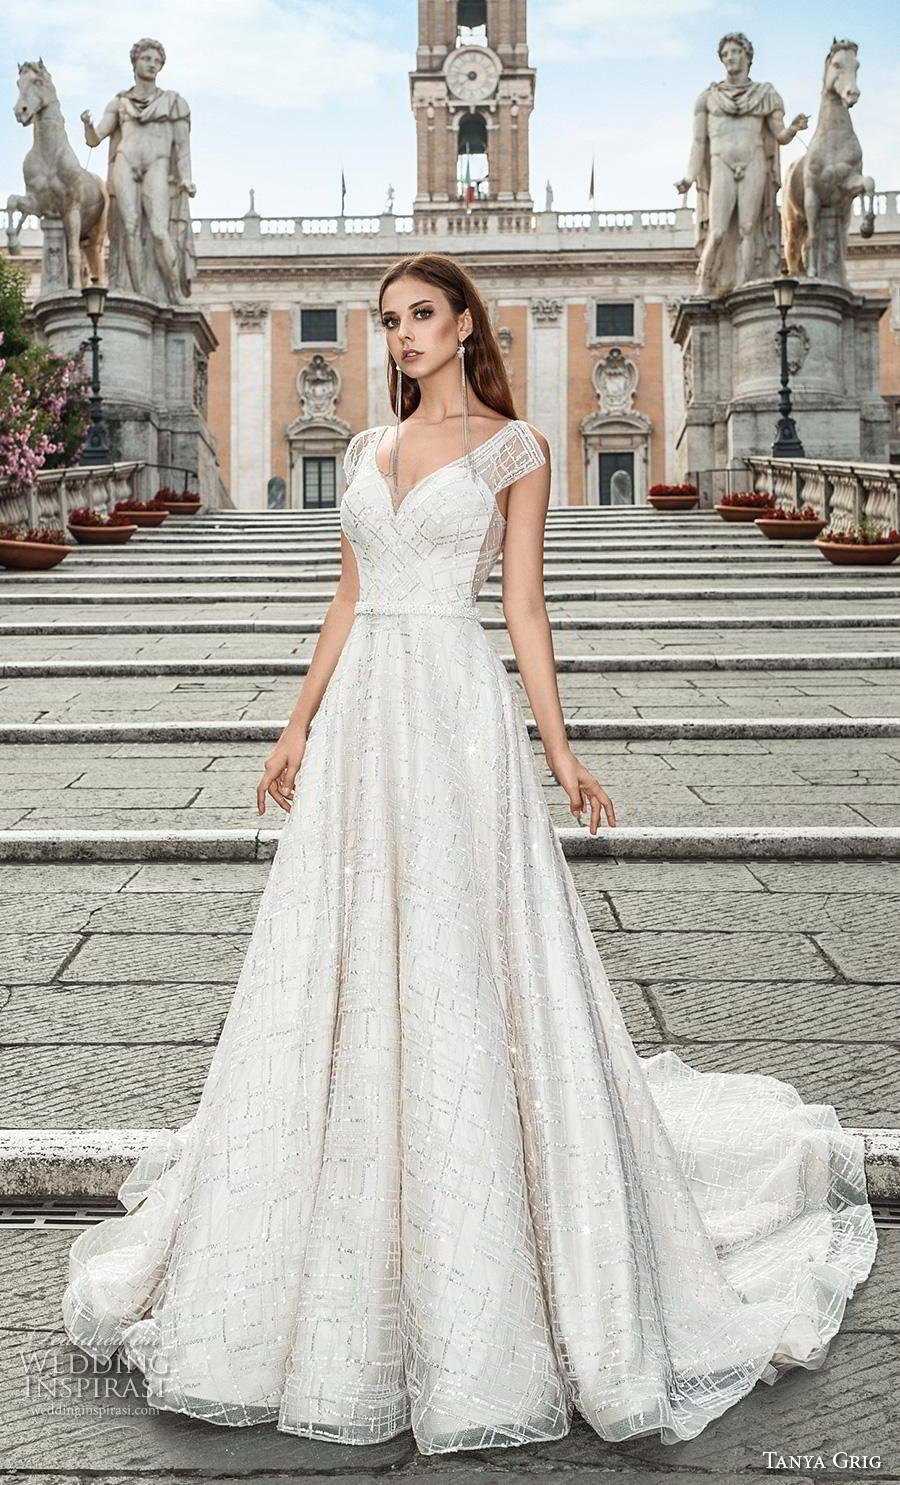 Tanya Grig 2019 Wedding Dresses Roman Holiday Bridal